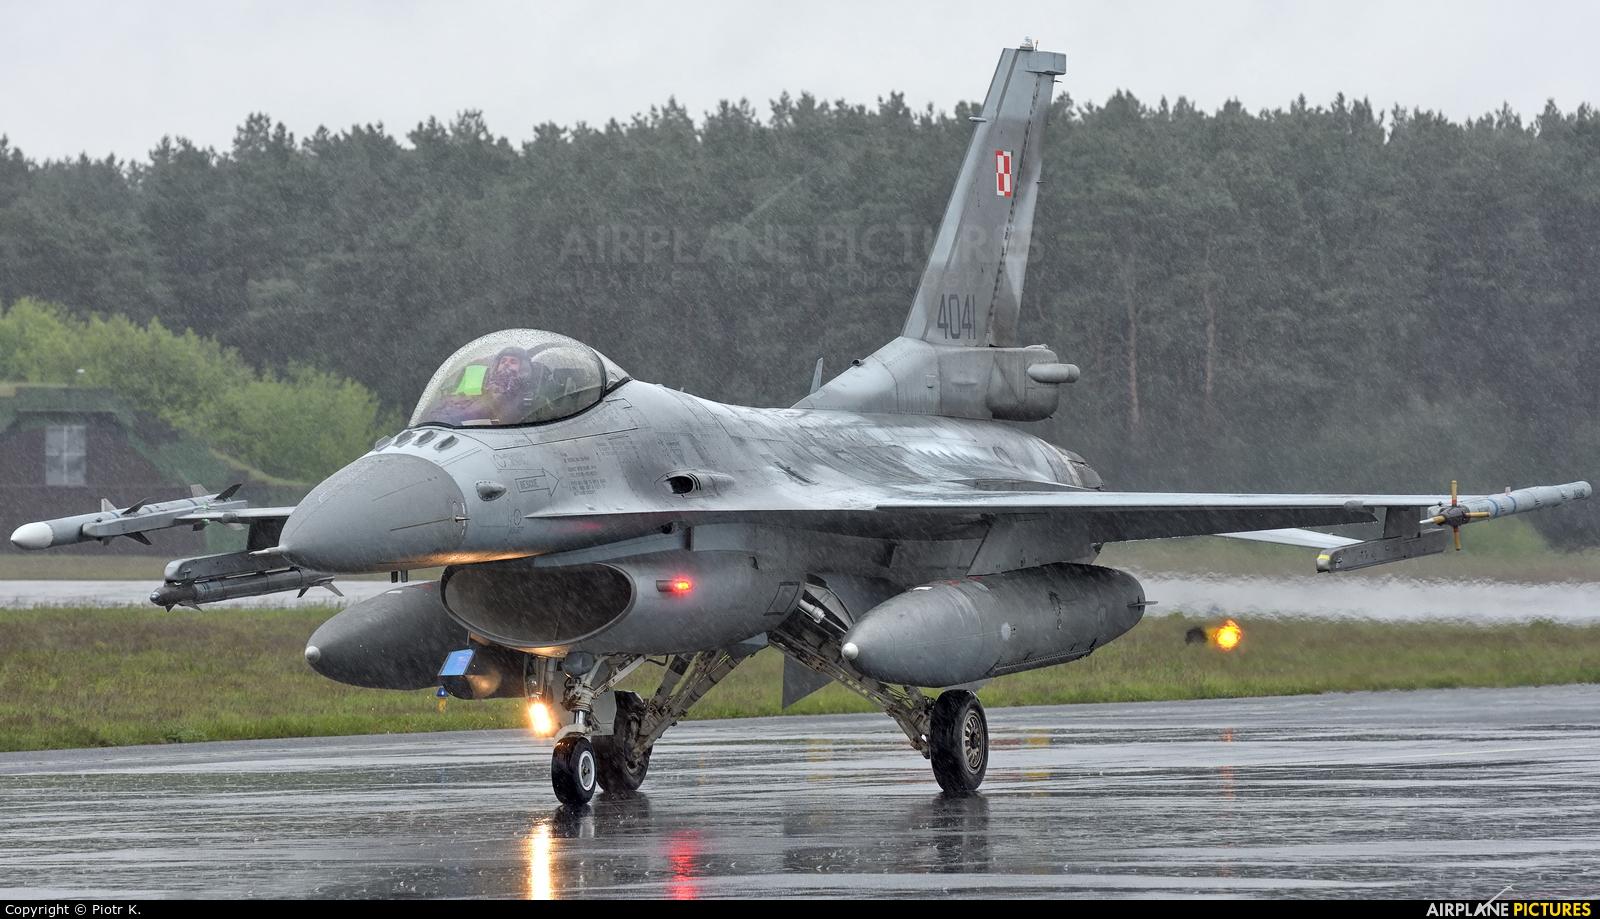 Poland - Air Force 4041 aircraft at Bydgoszcz - Szwederowo